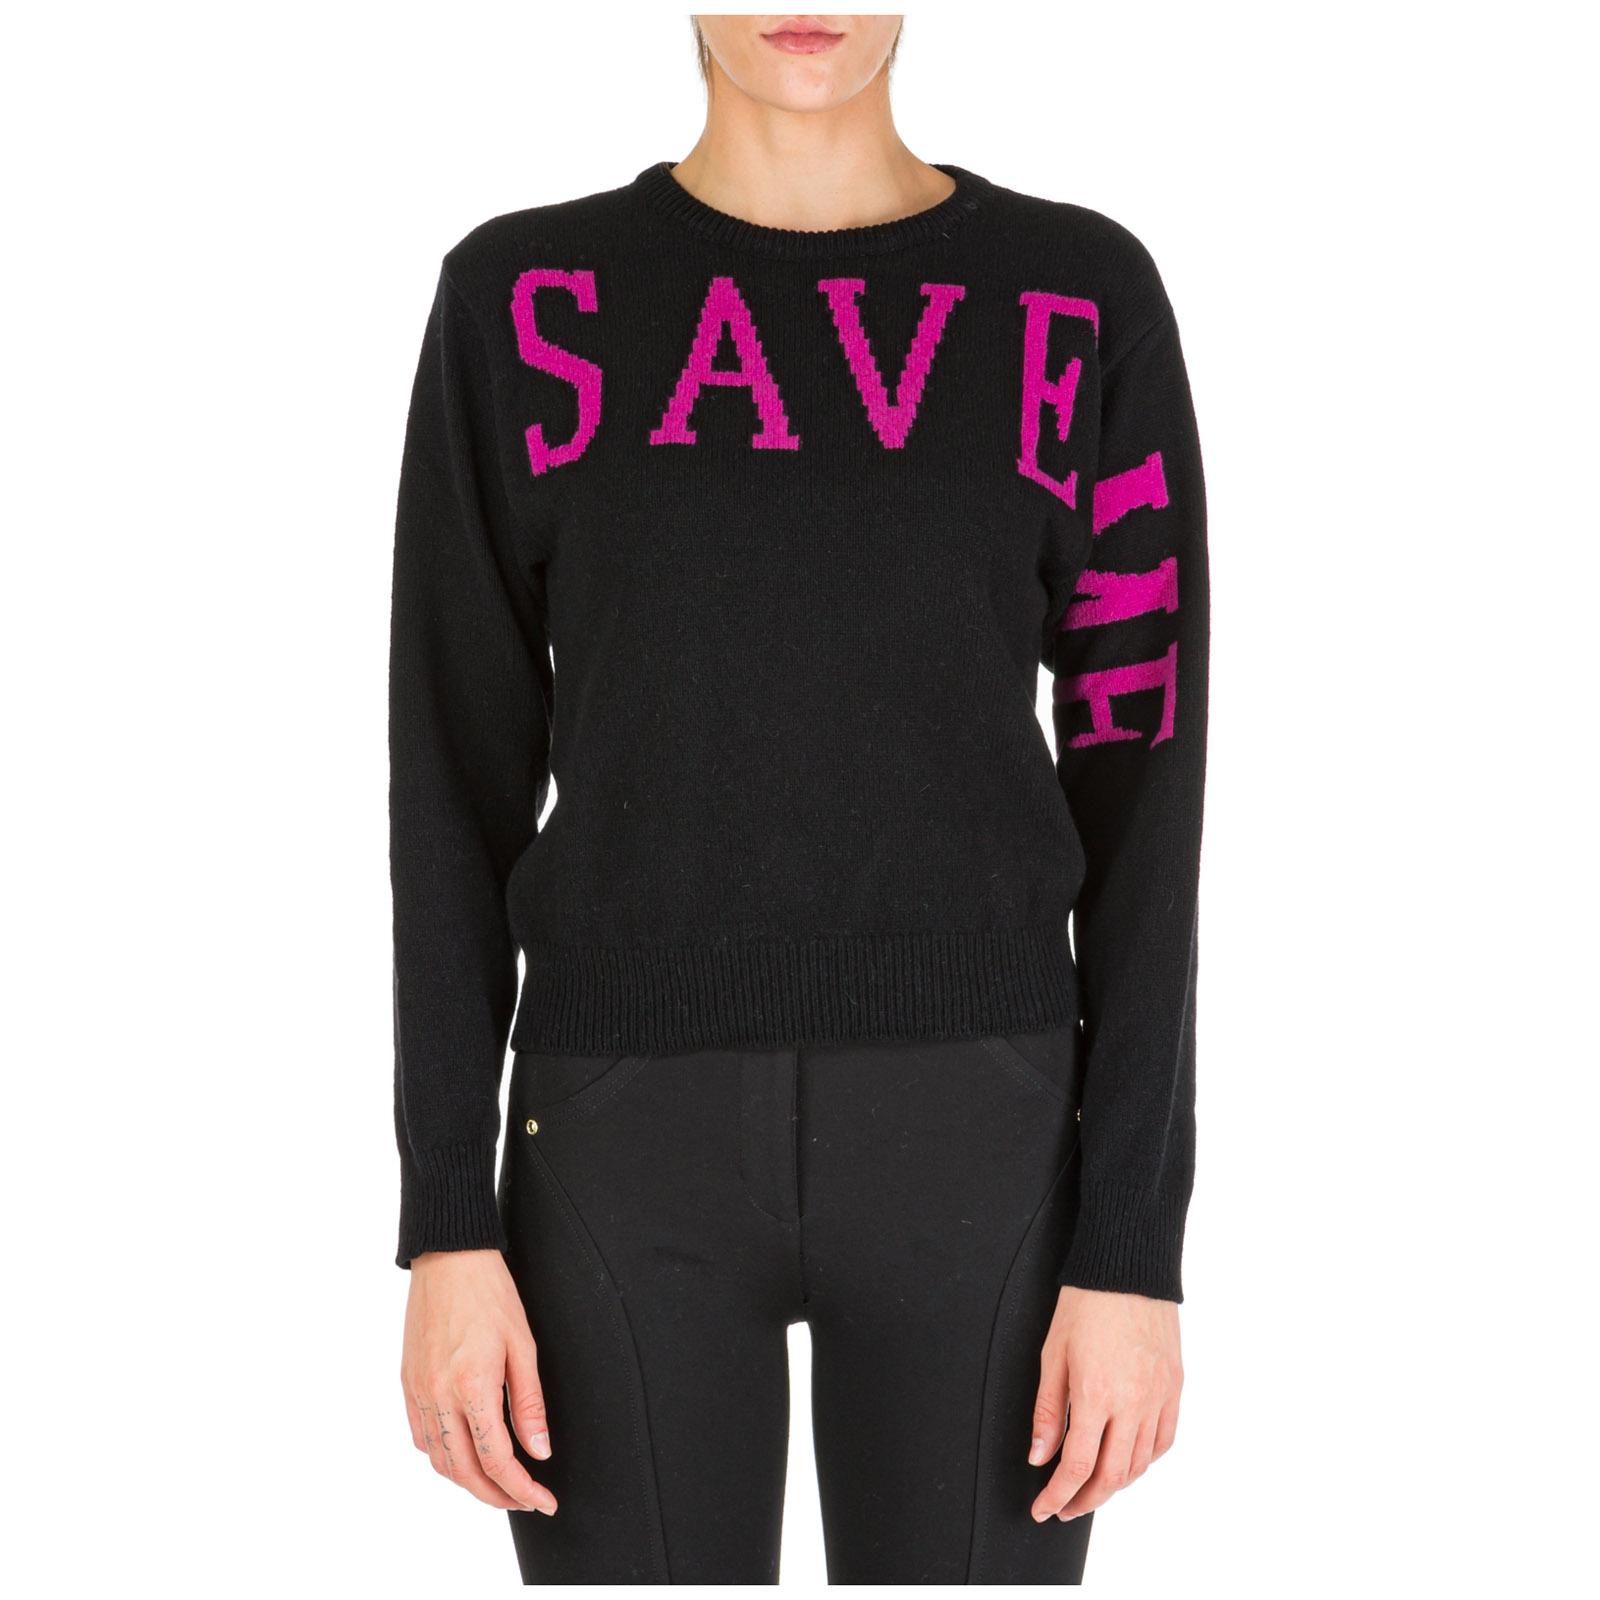 Women's jumper sweater crew neck round save me